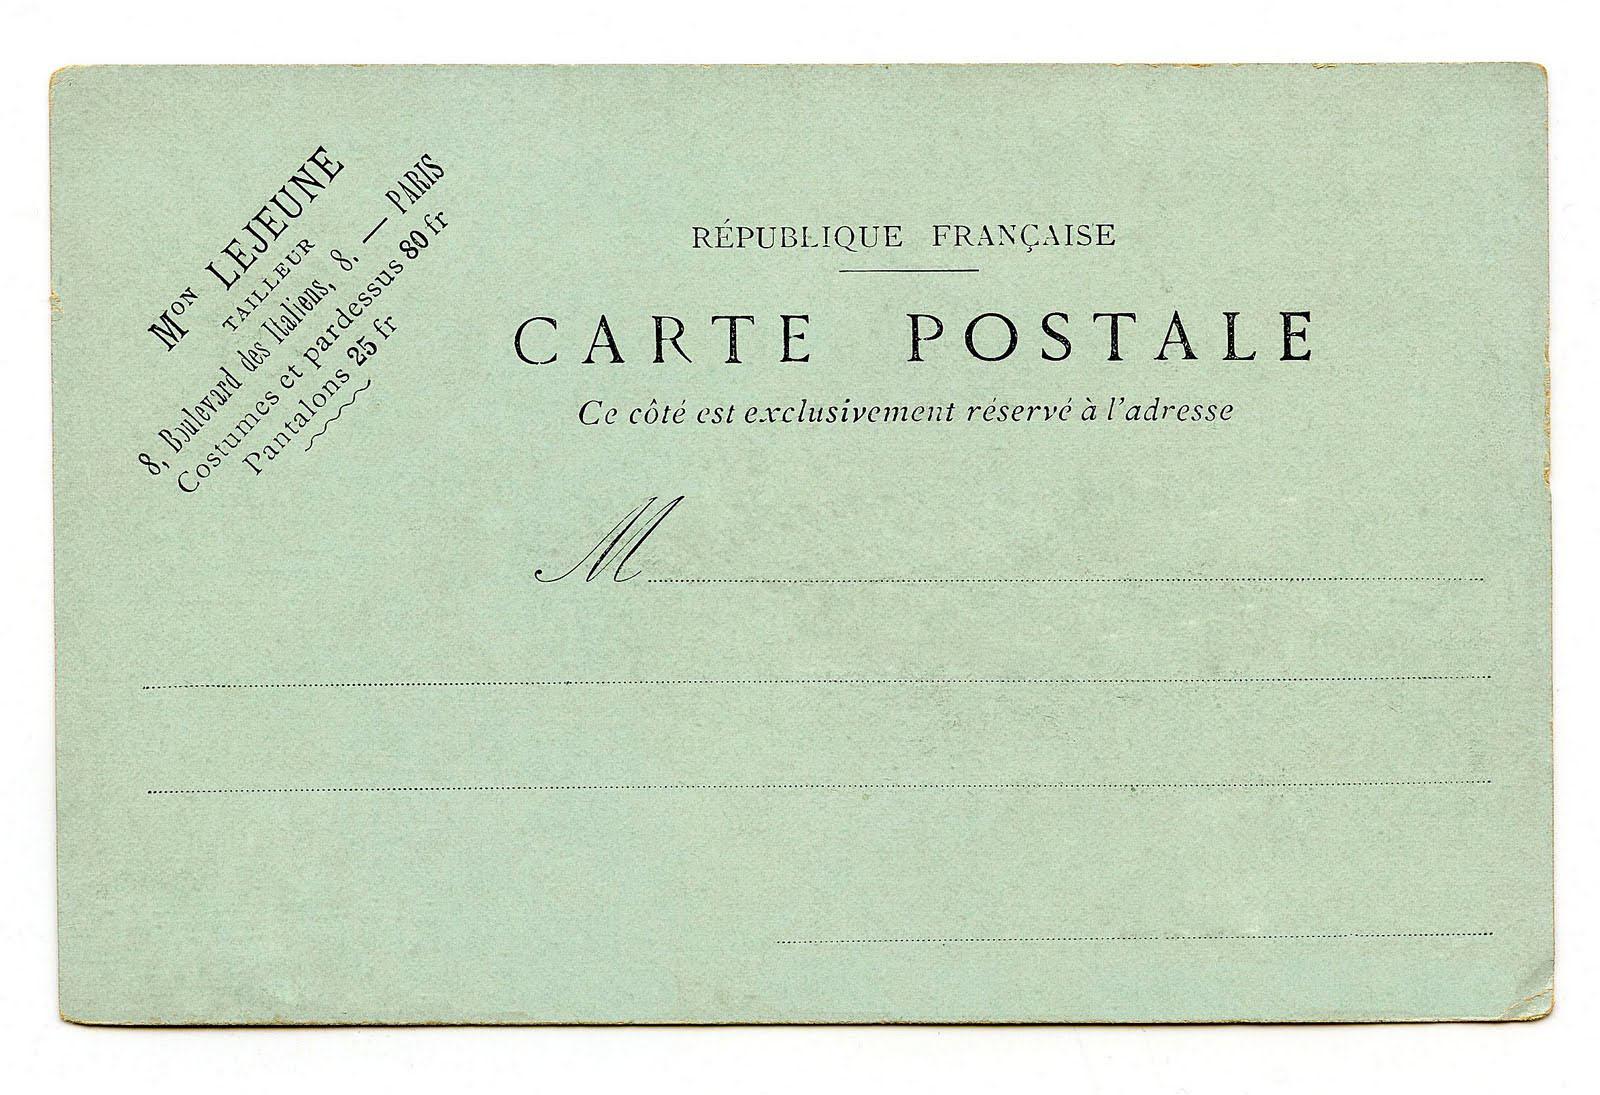 1a-parispostcard-graphicsfairy010green